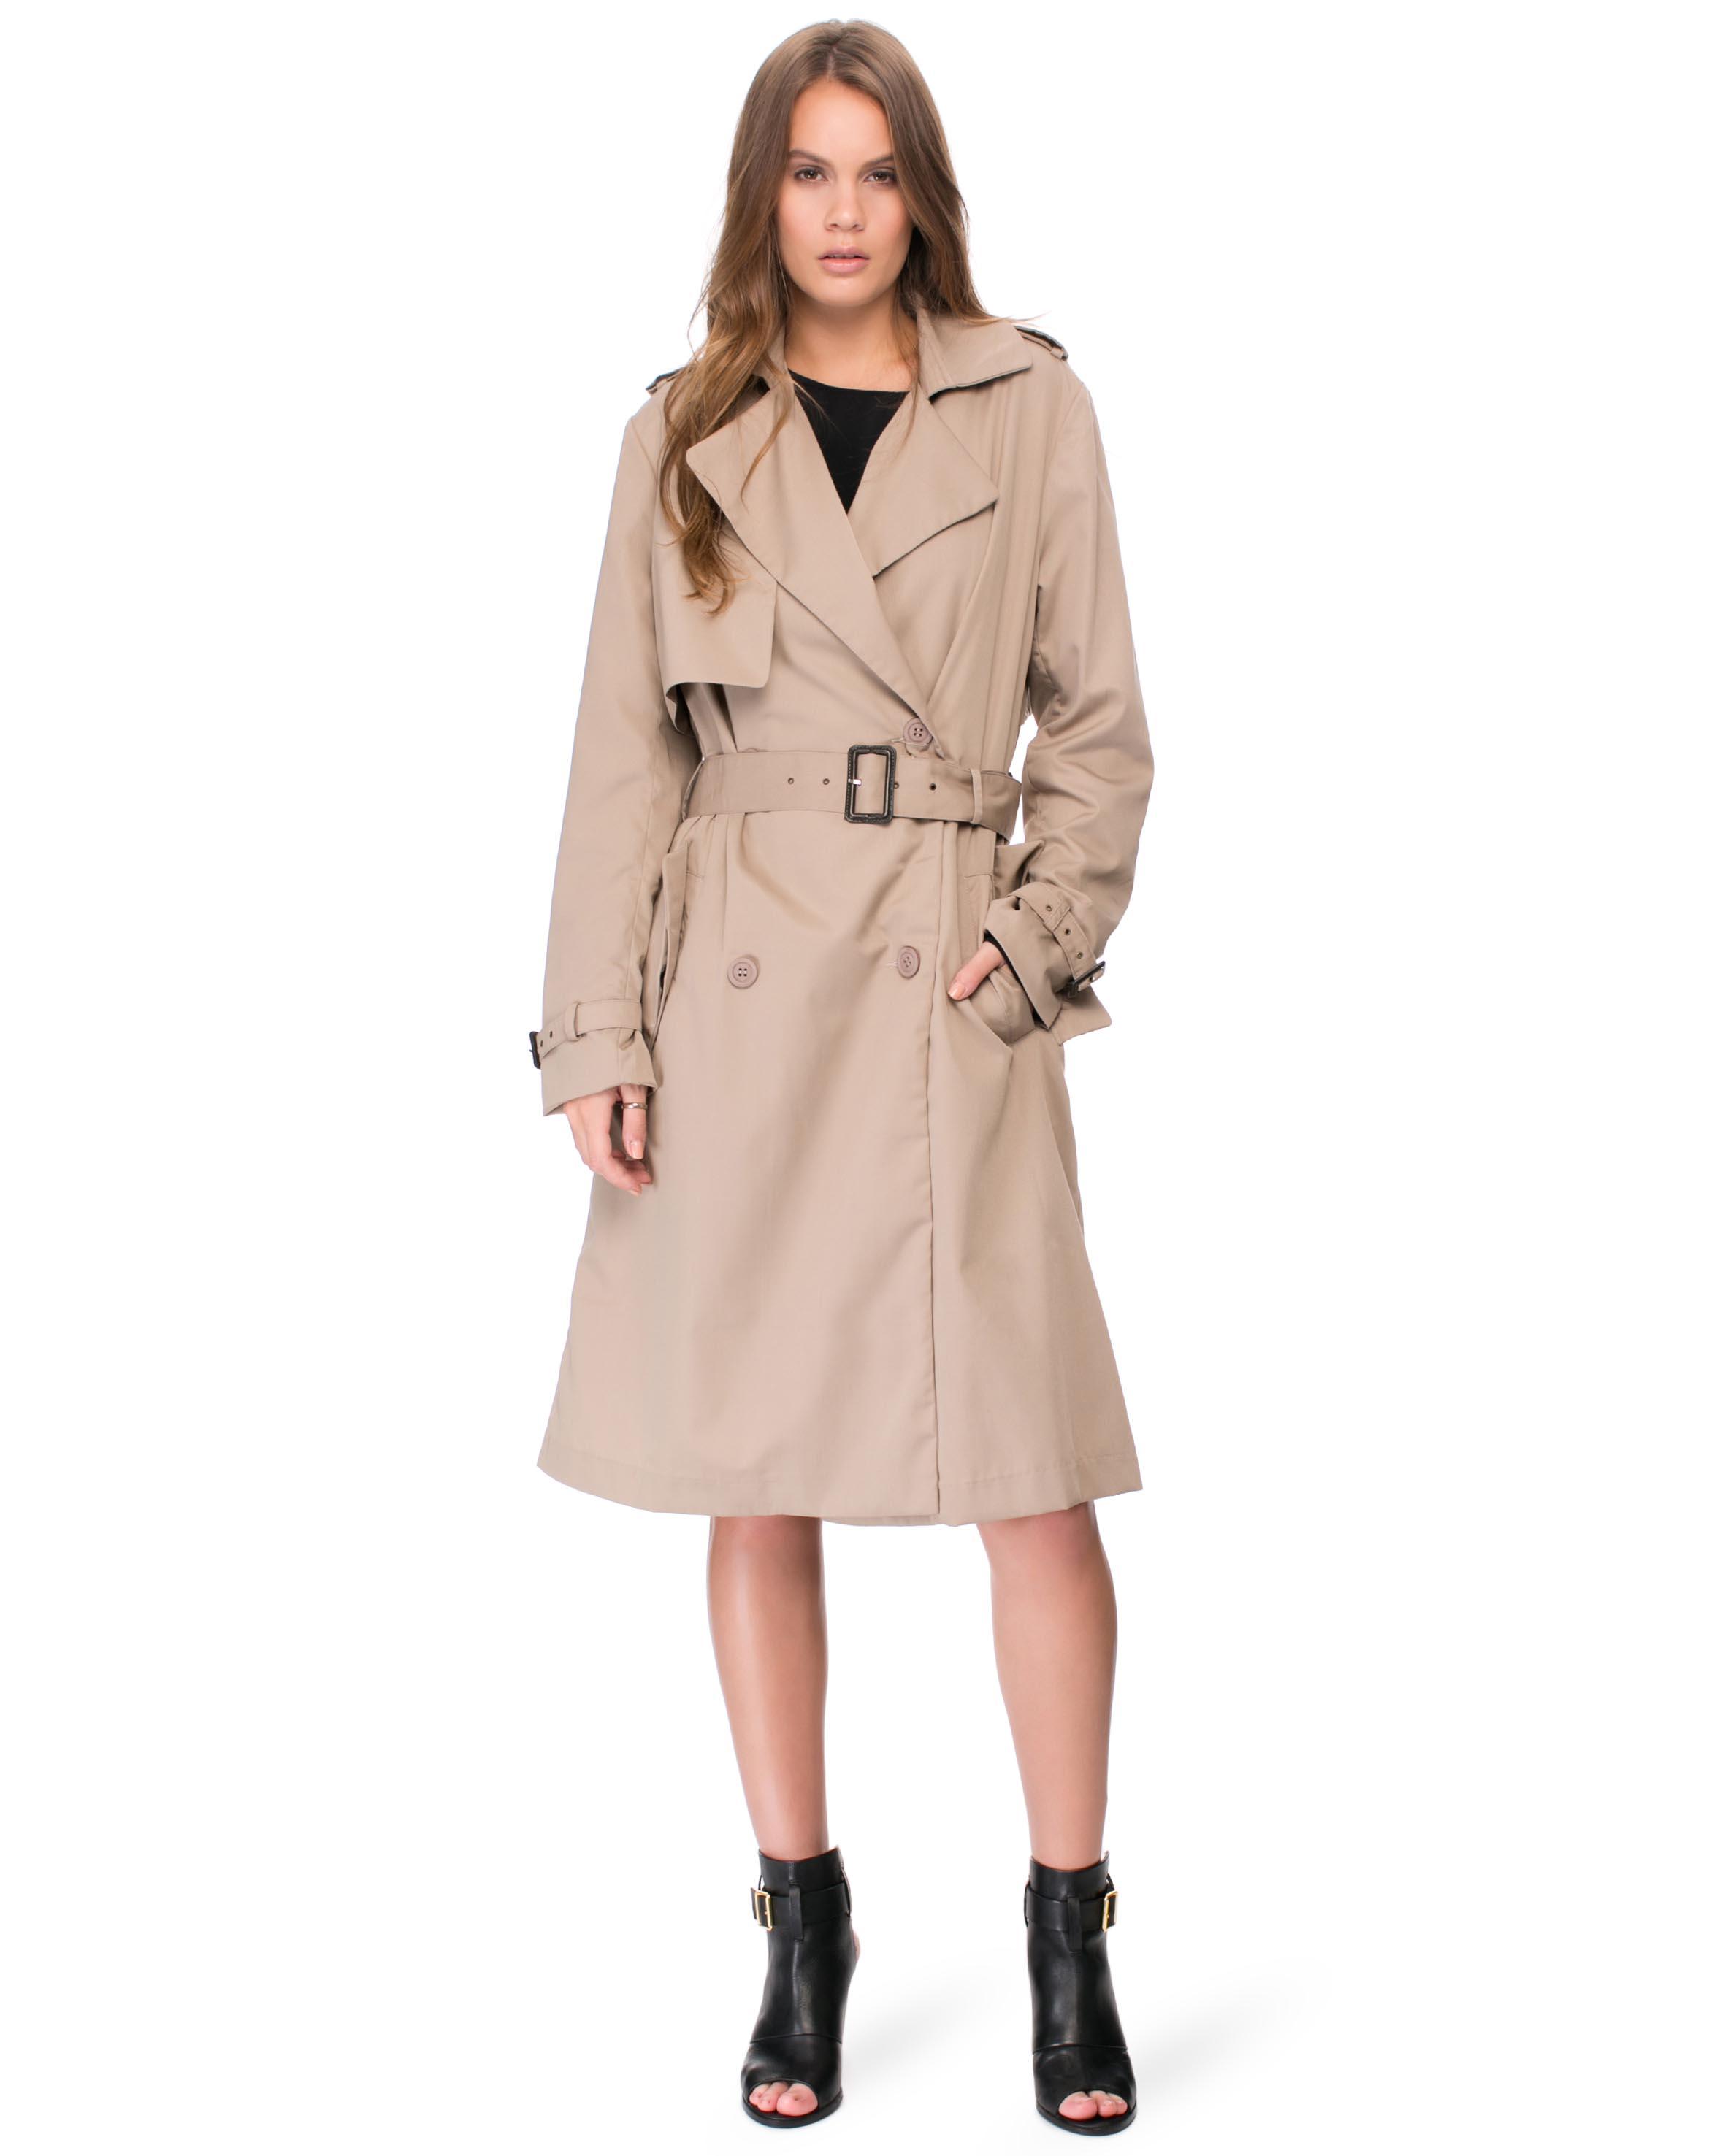 Trench Coat | Trench Coats Online | Buy Womens Trench Coat